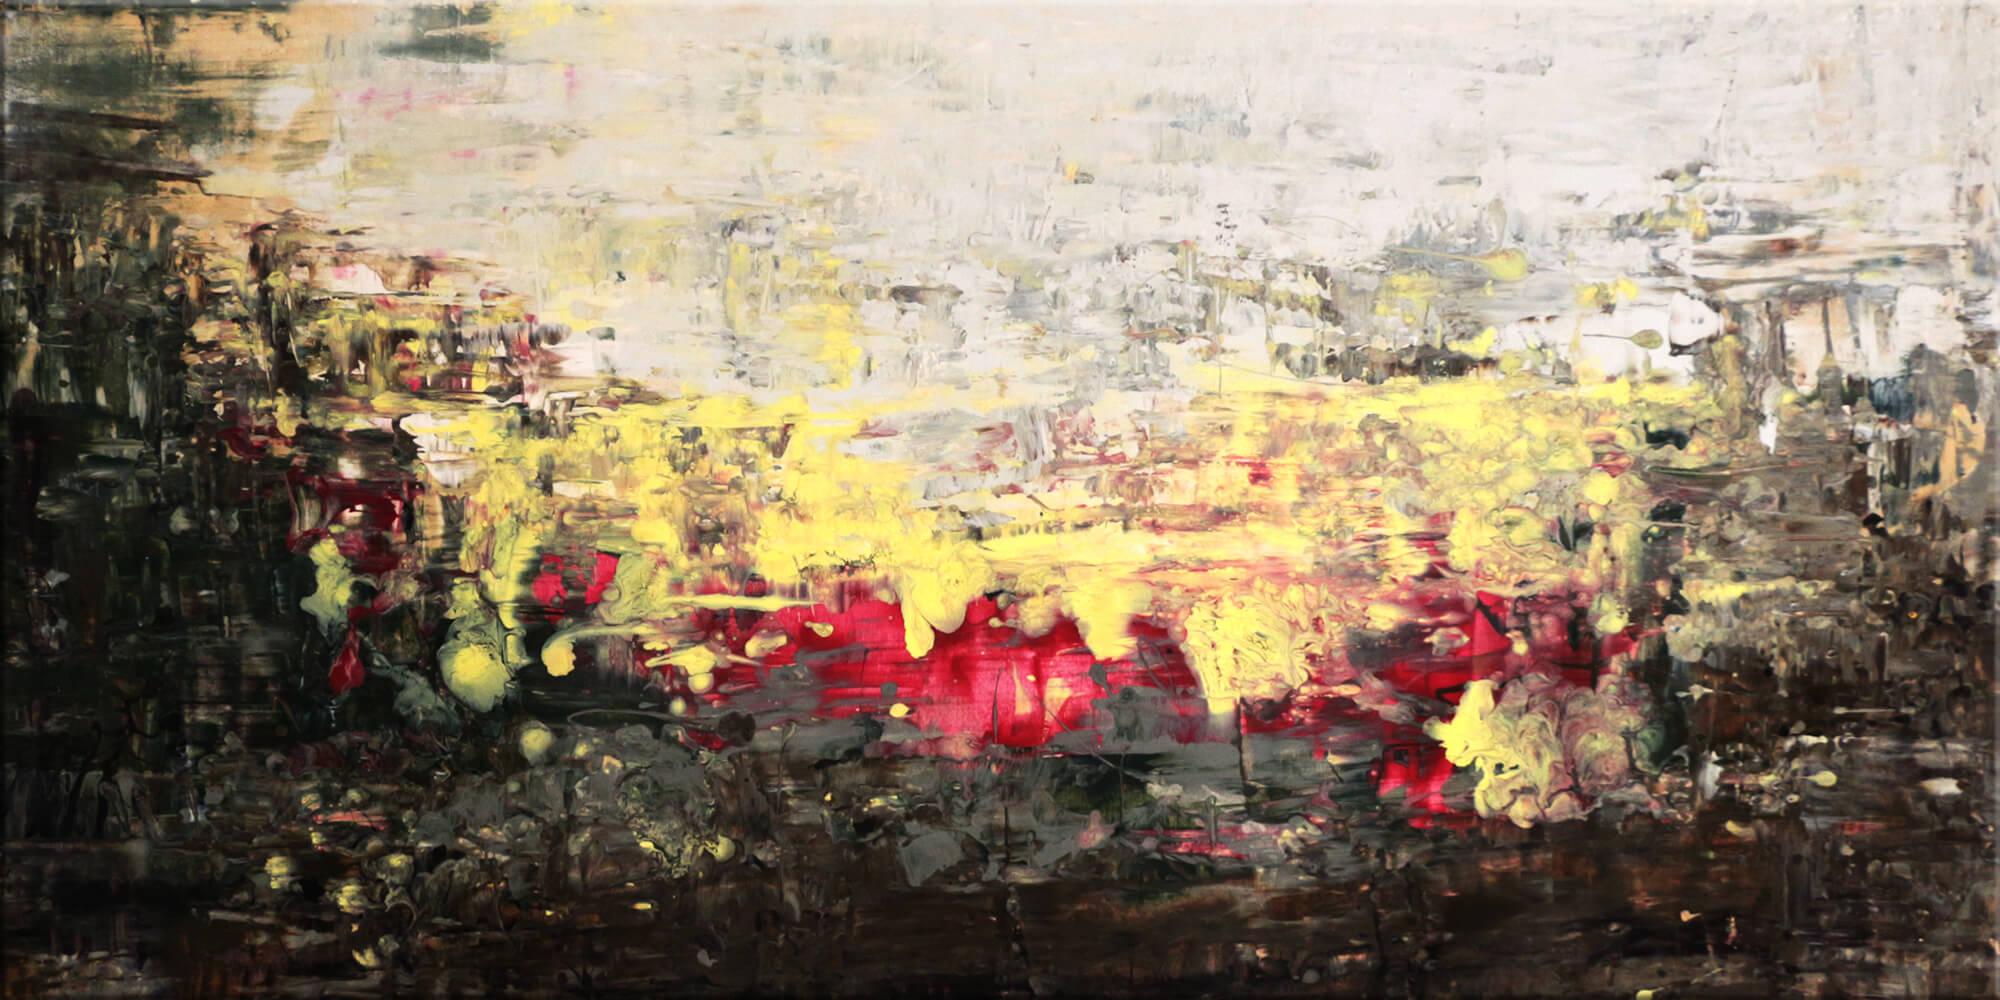 Original Gemälde von Noah de Jong Tanz der Elfen